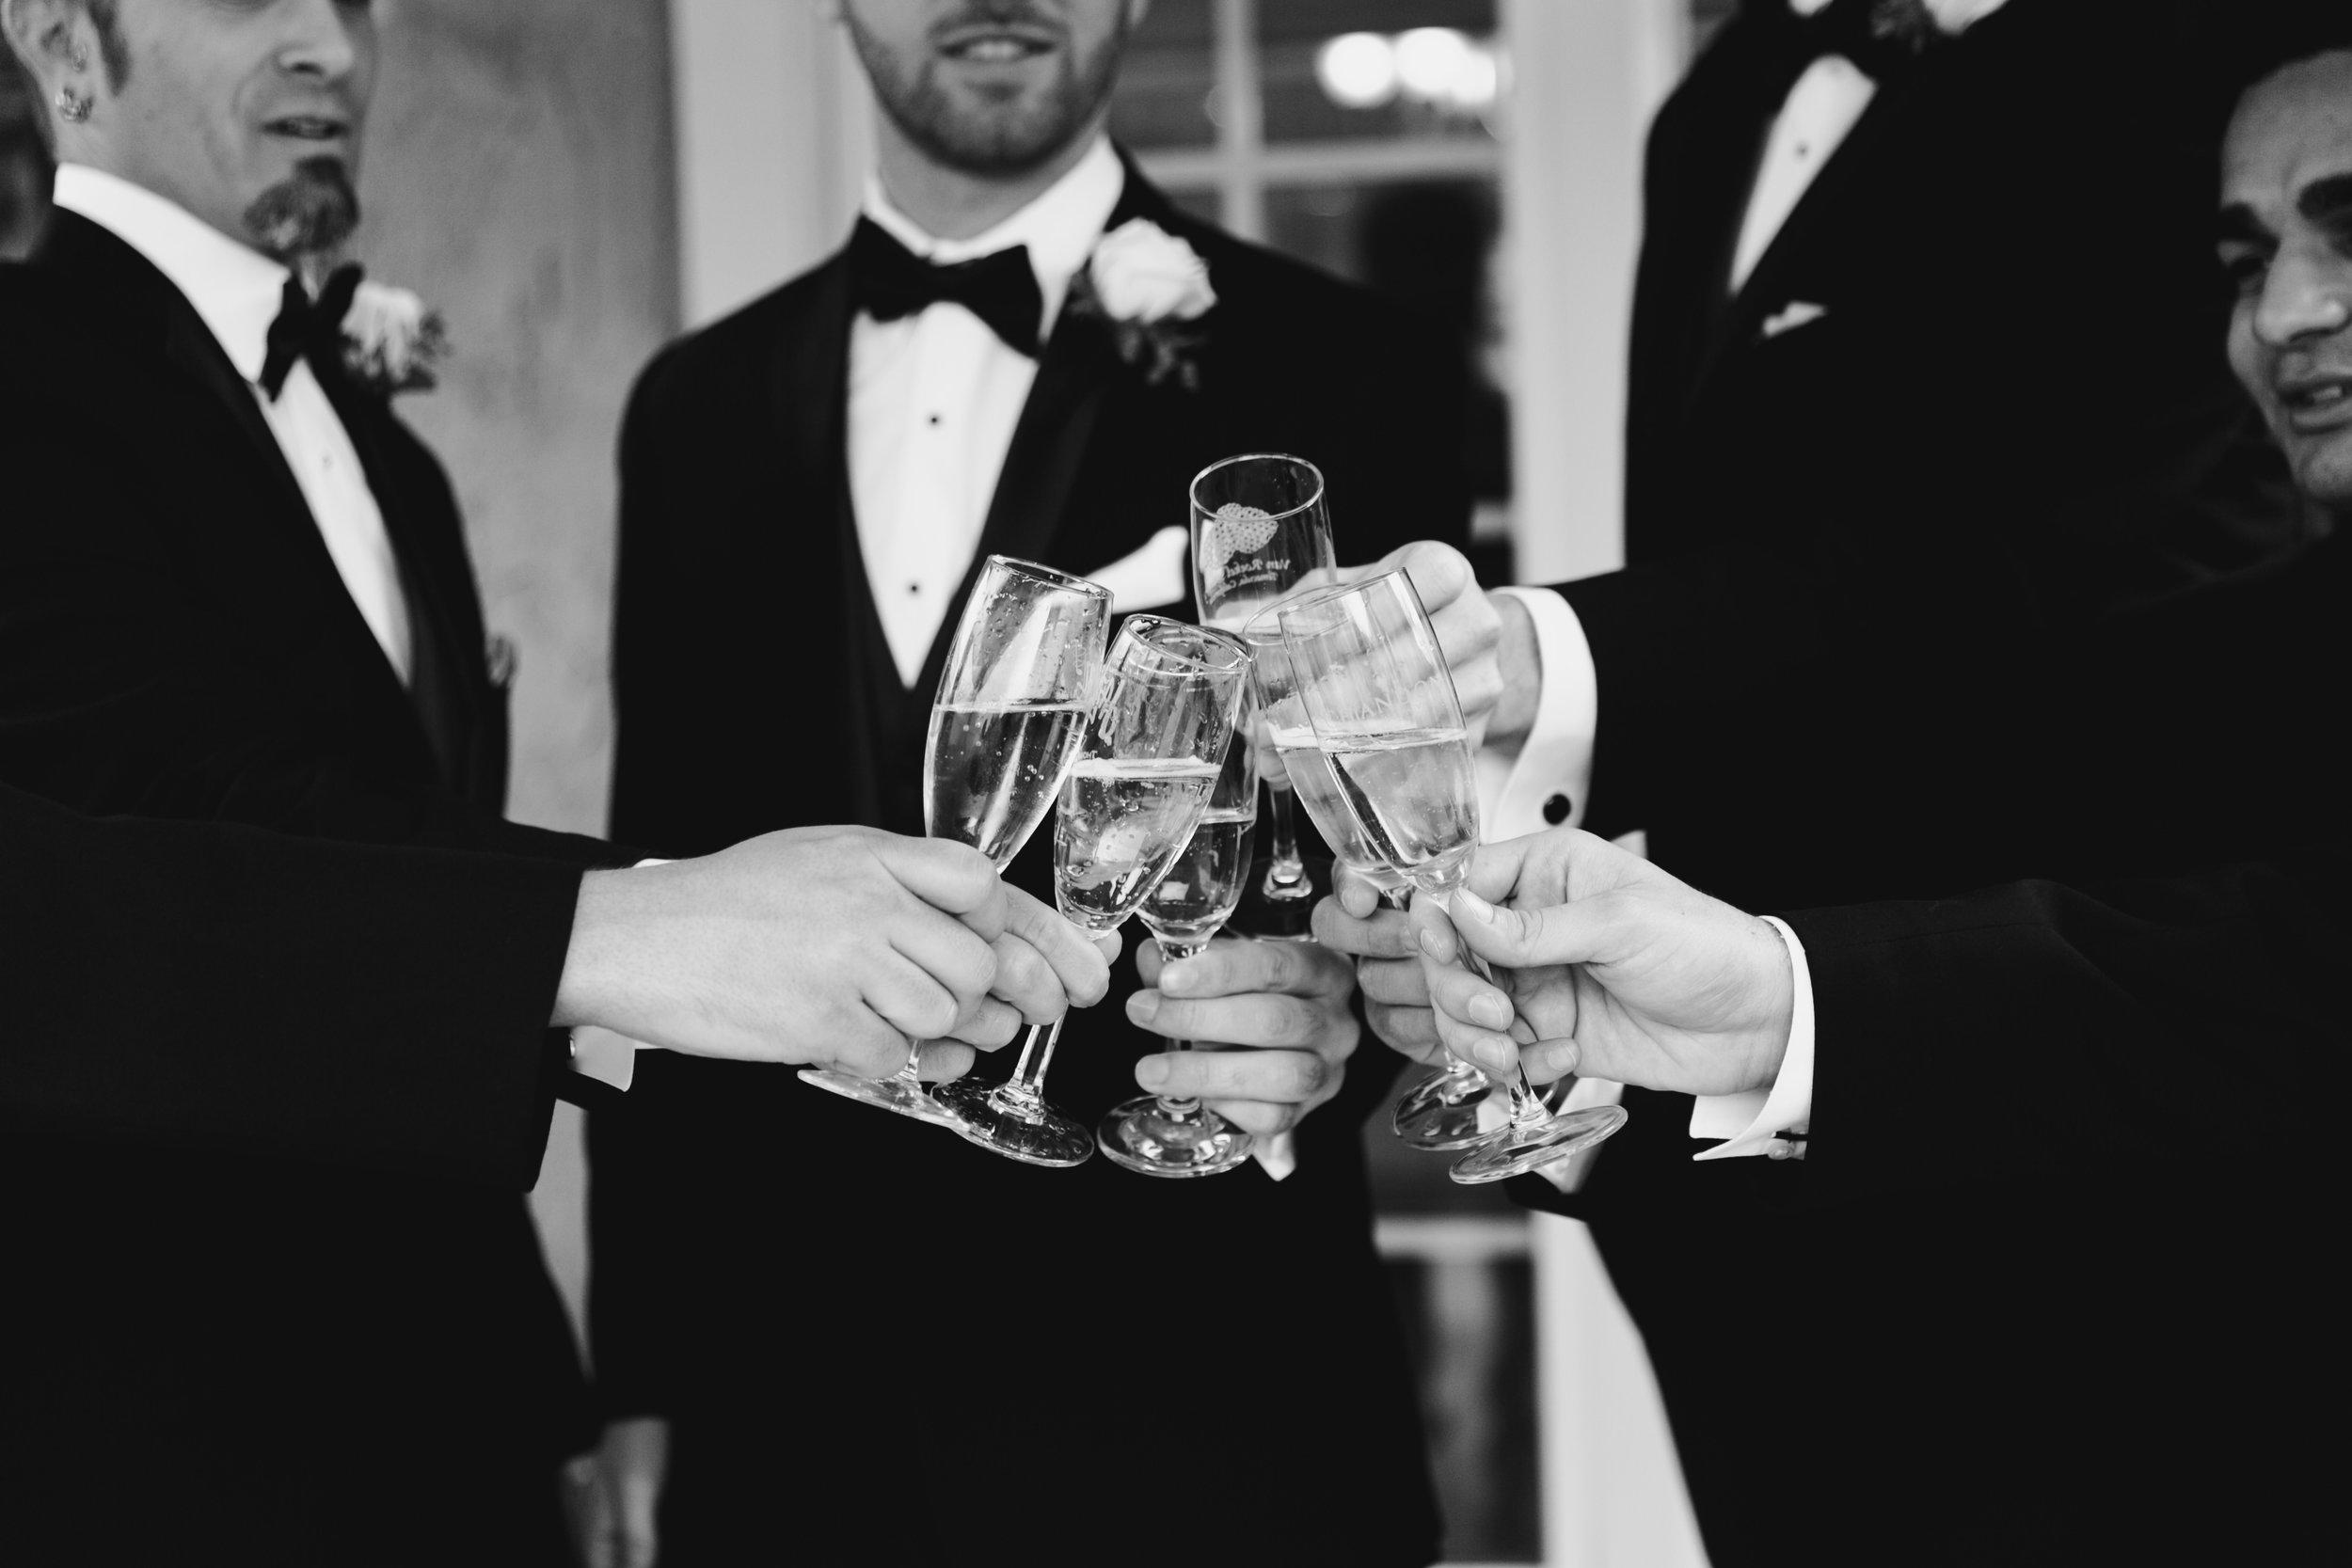 OC wedding photographer, Southern California wedding photographer, Orange County wedding photographer, SoCal wedding photographer, Huntington Beach wedding photographer, Black Tie wedding